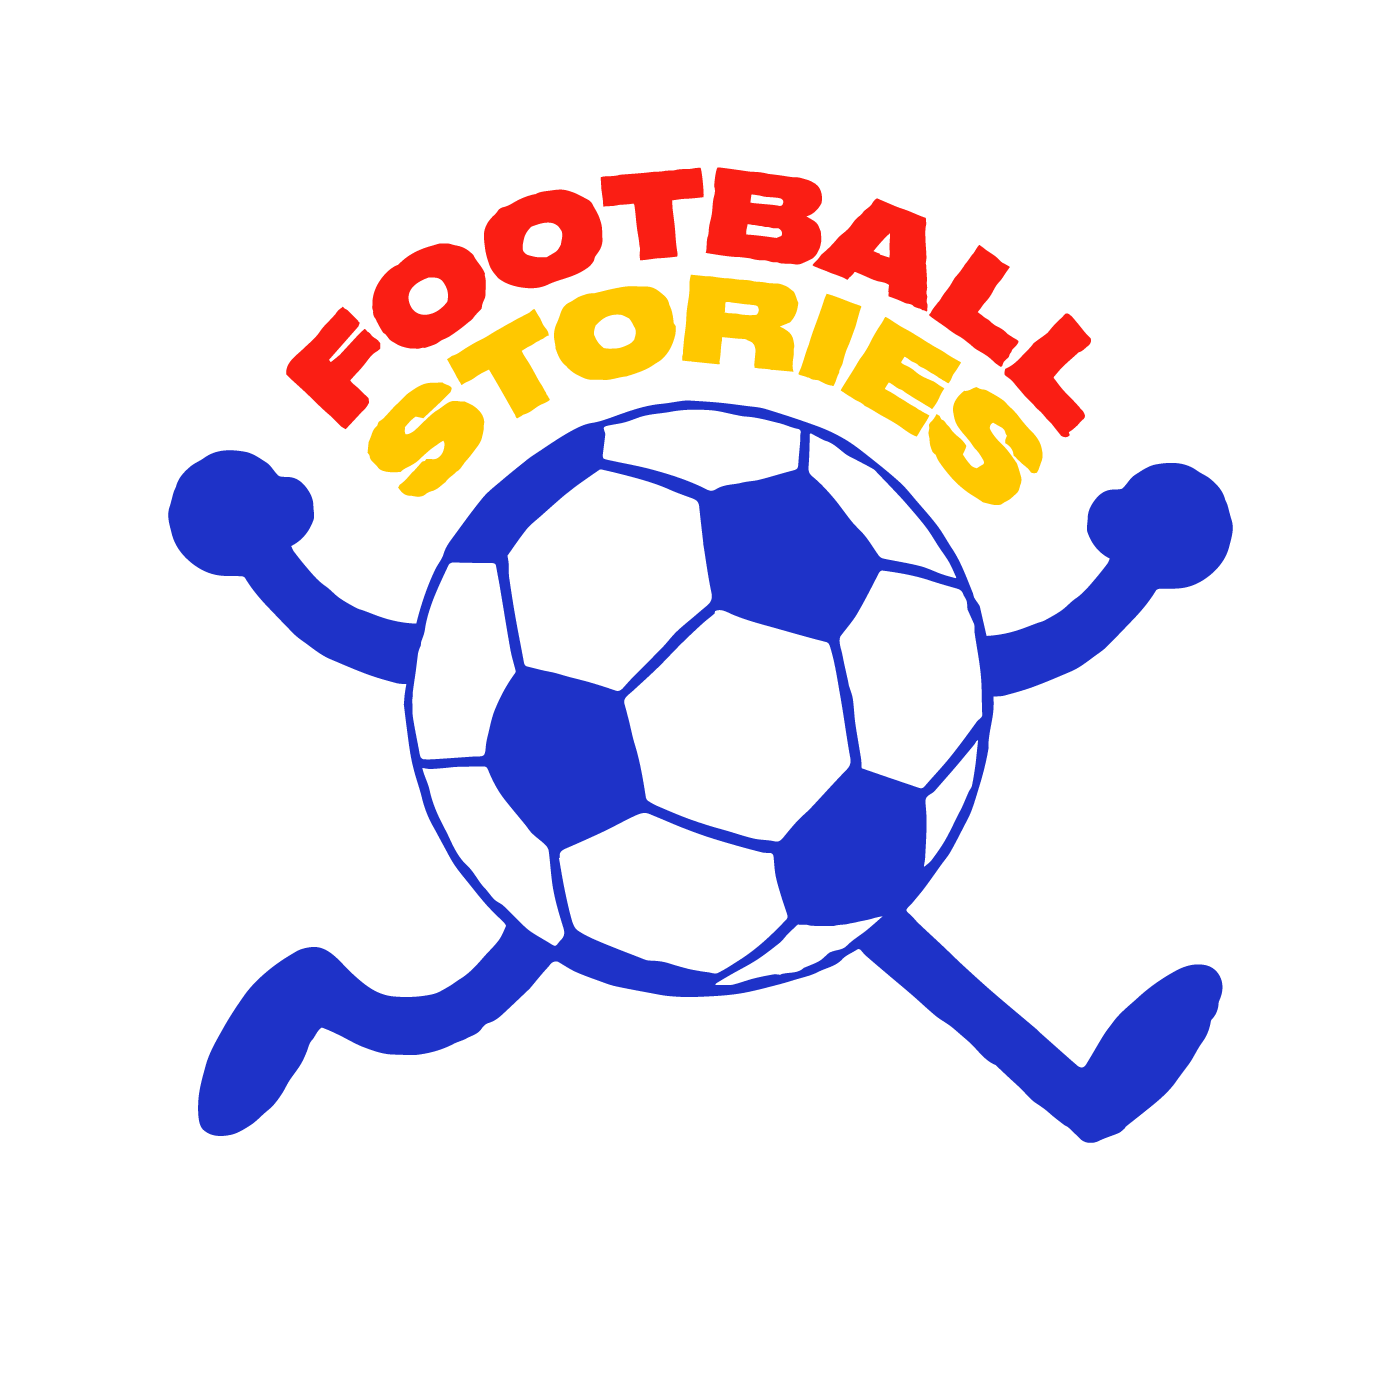 Konbini logo